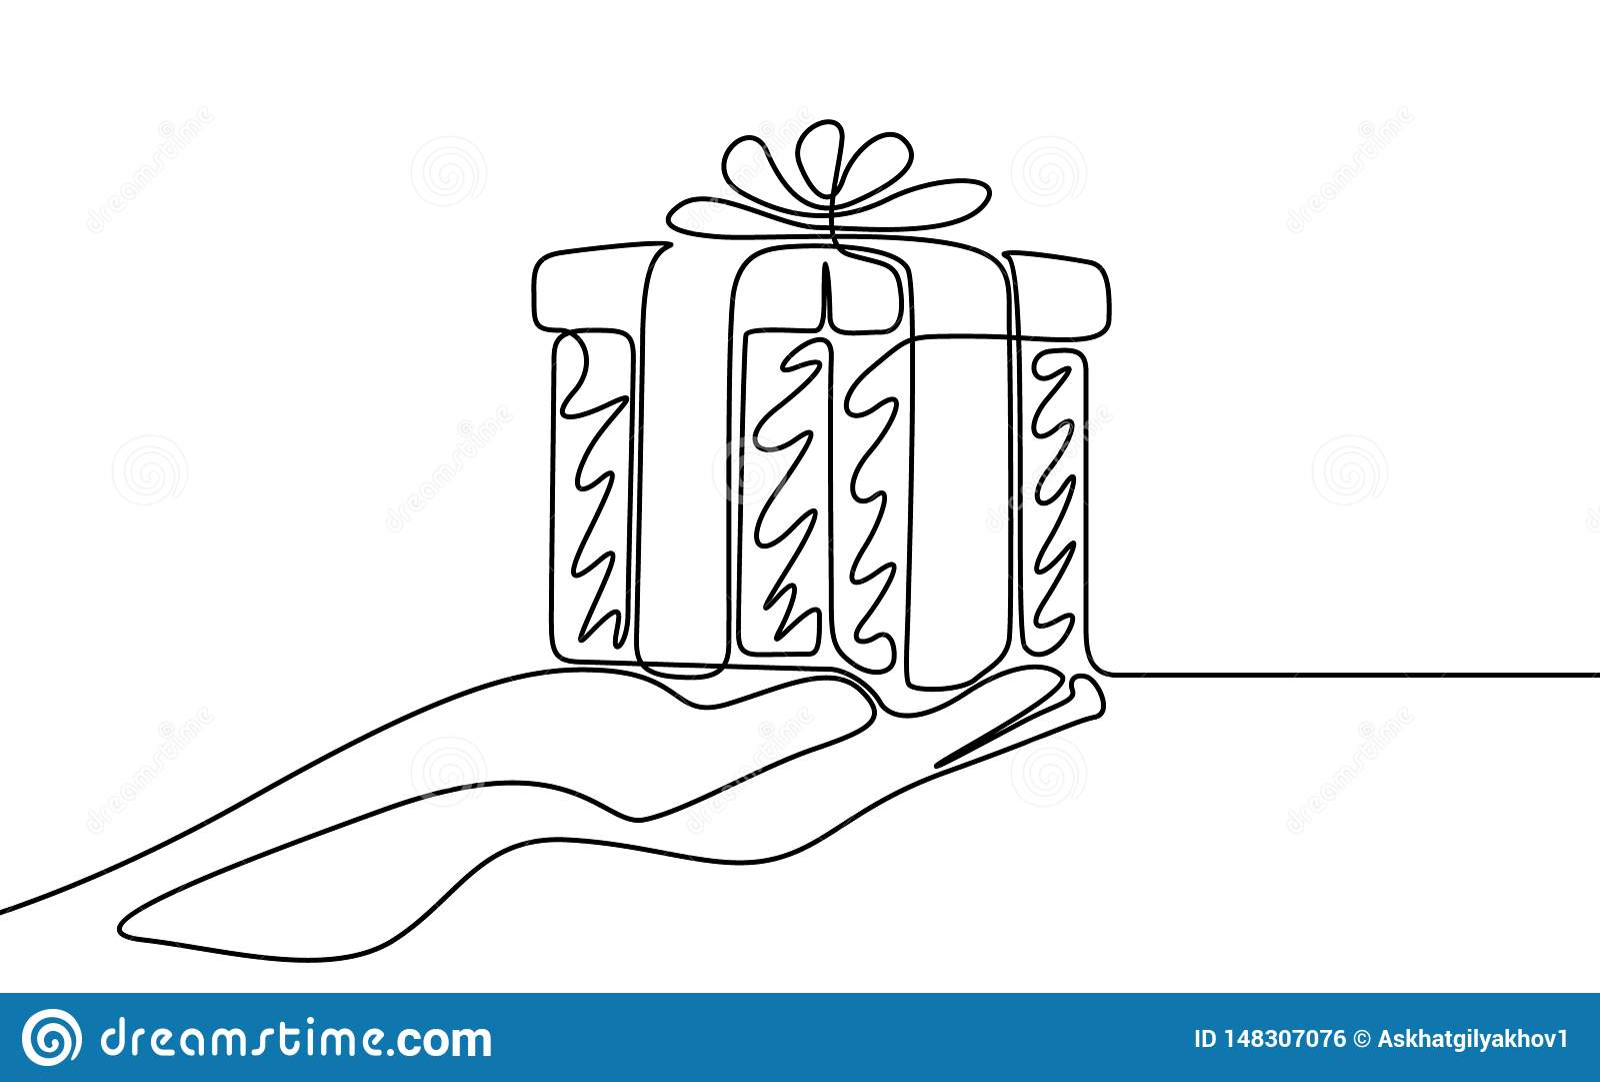 Un dibujo lineal continuo dar un regalo Ilustraci?n del vector